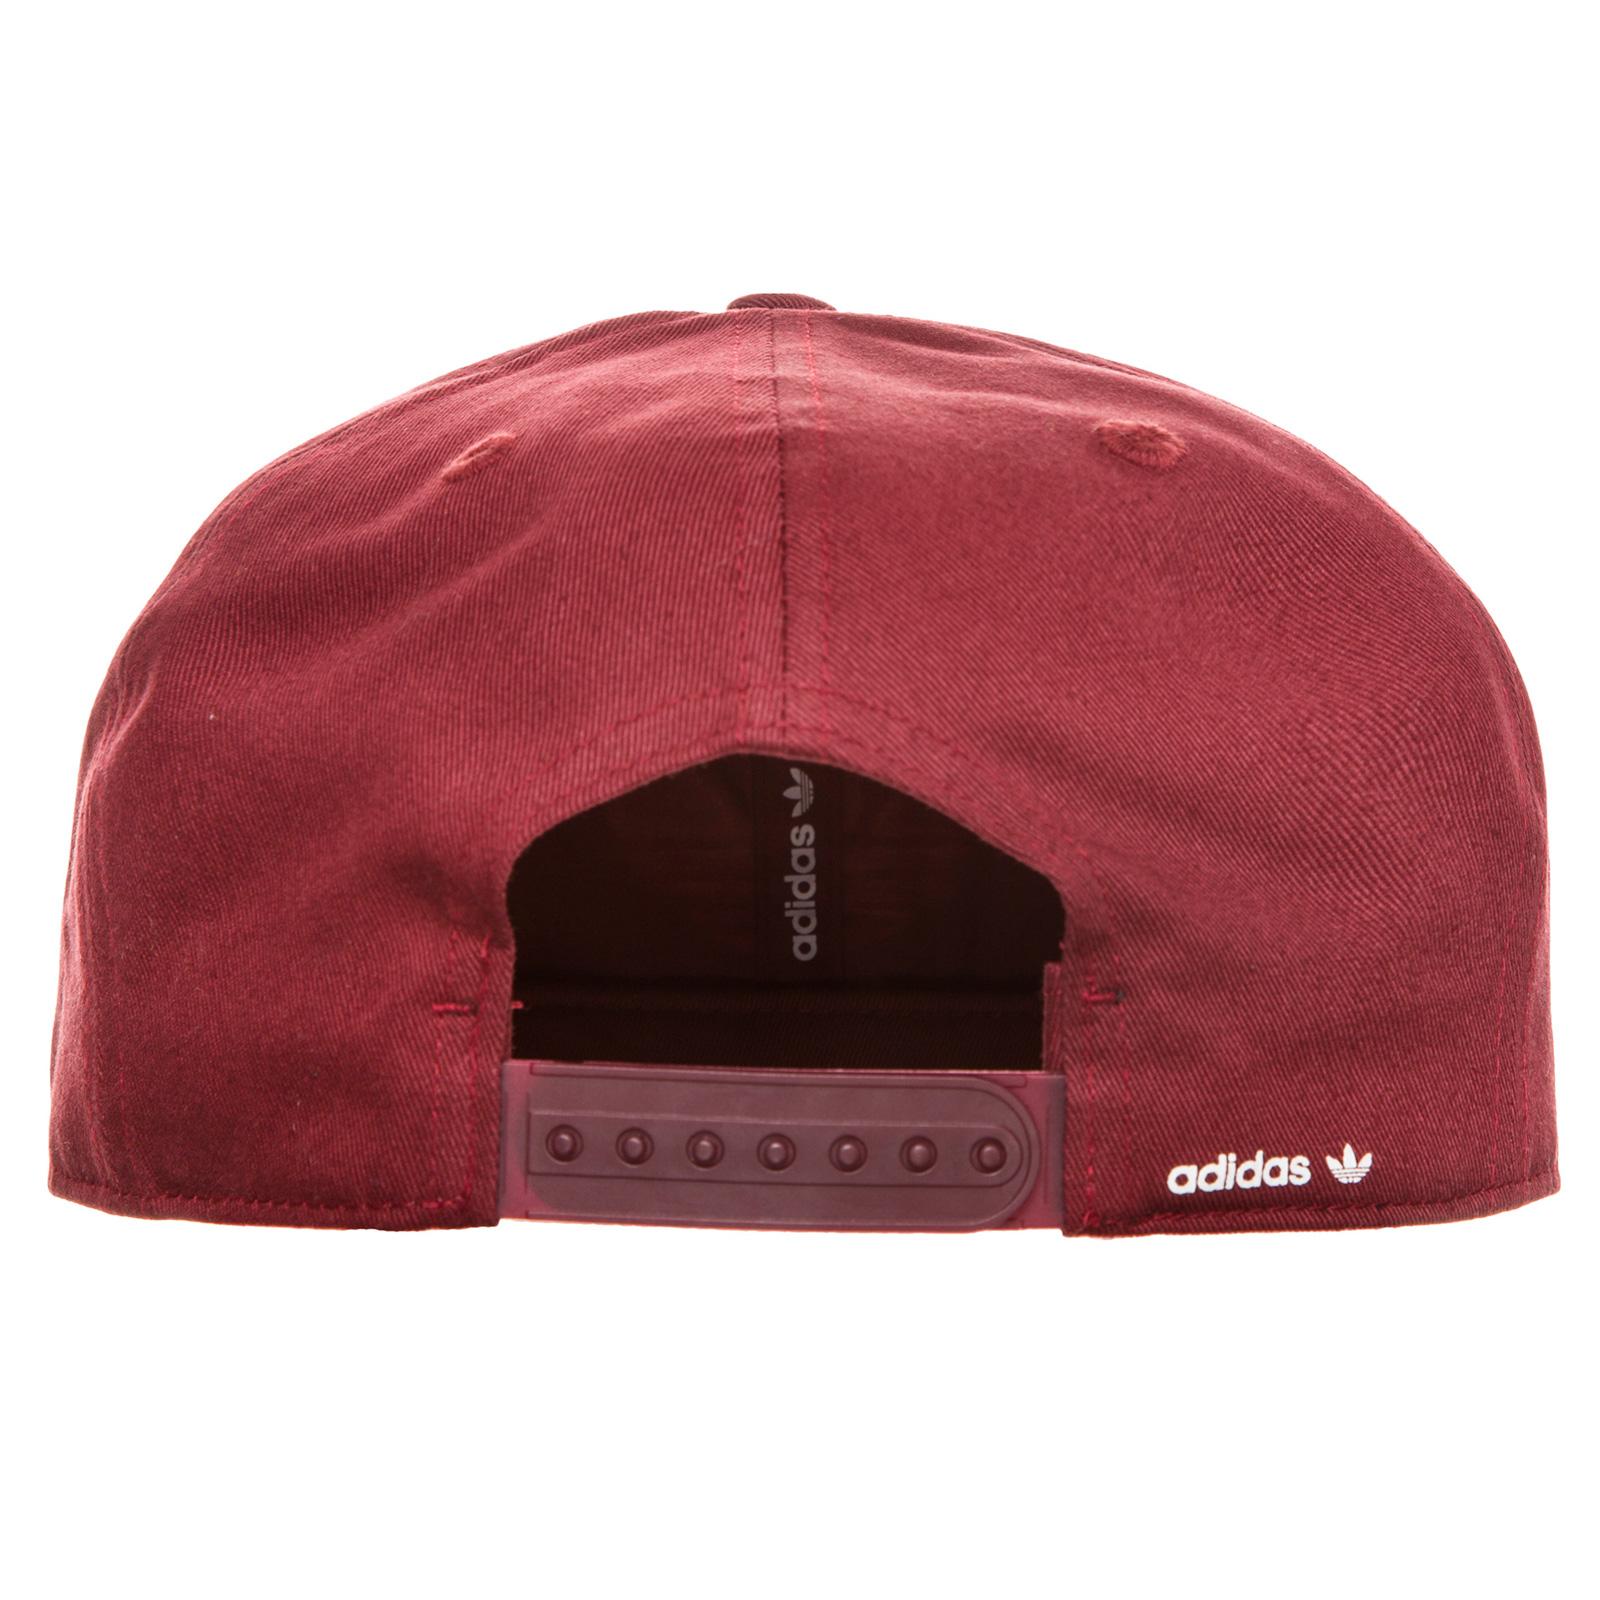 ☆ Adidas Originals Snapback Cap Trefoil weinrotweiß hier